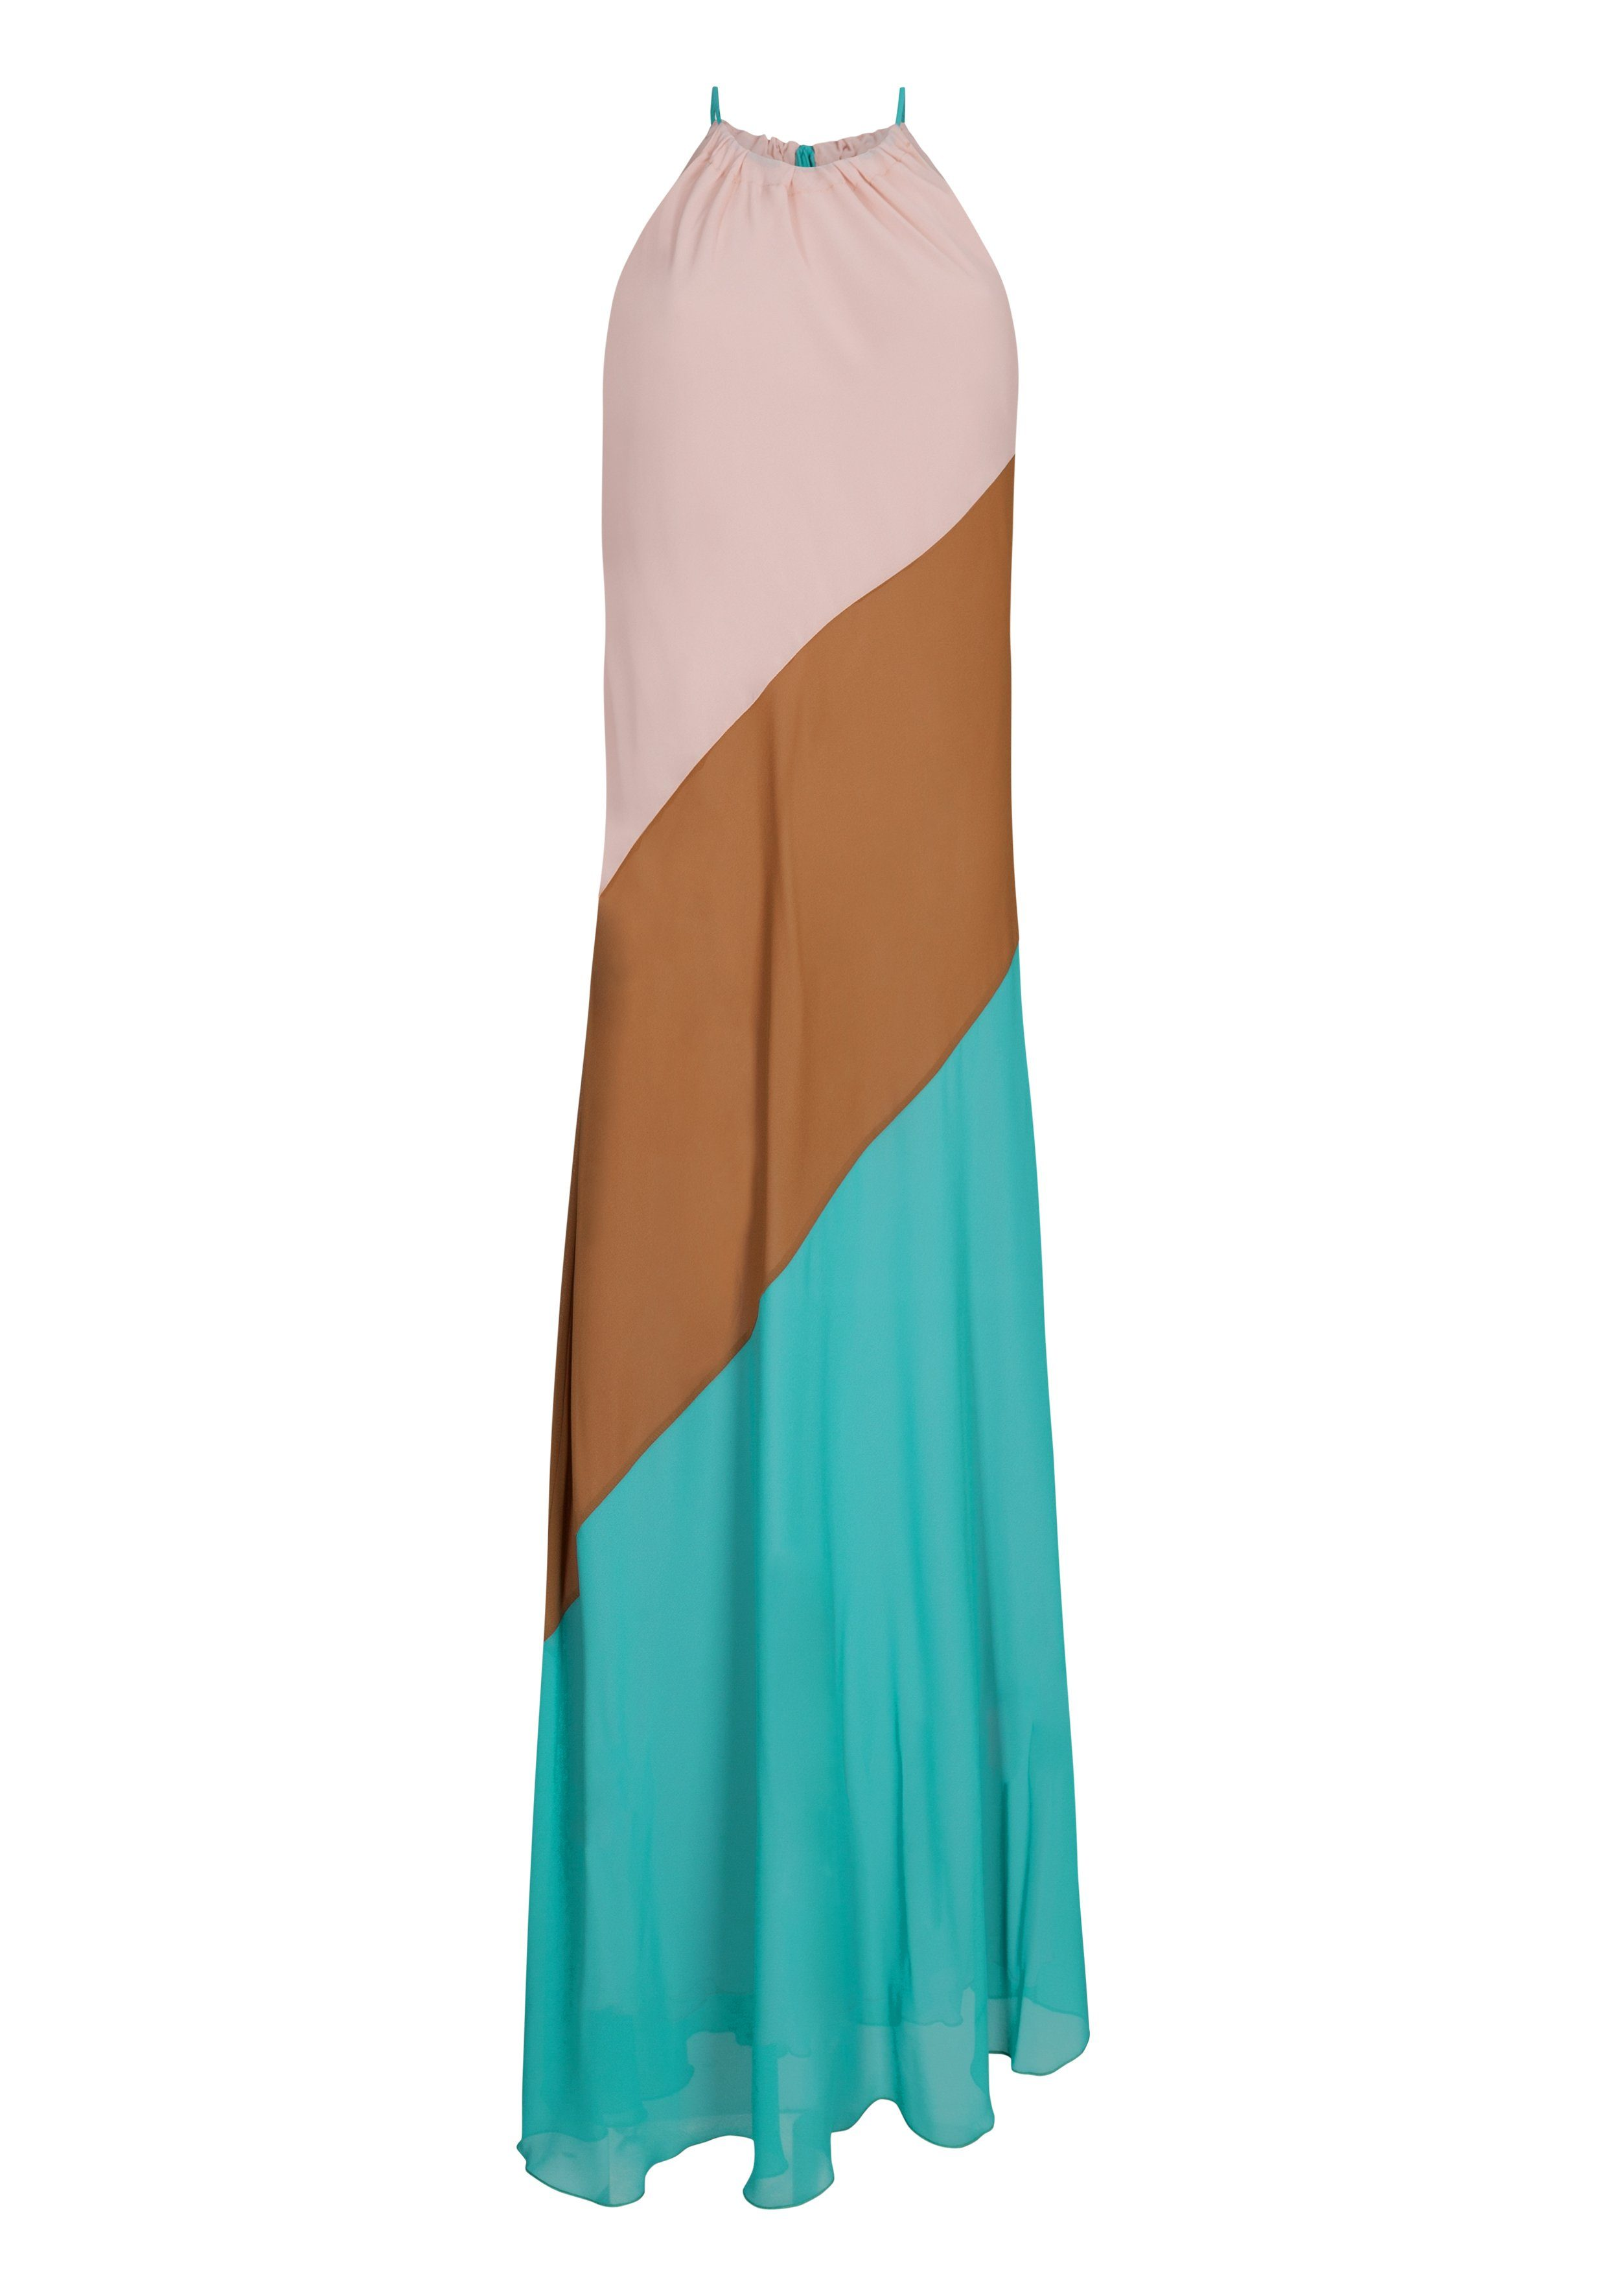 NICOWA Maxikleid VANIA mit Neckholder | Bekleidung > Kleider > Maxikleider | Rosa | Polyester | Nicowa